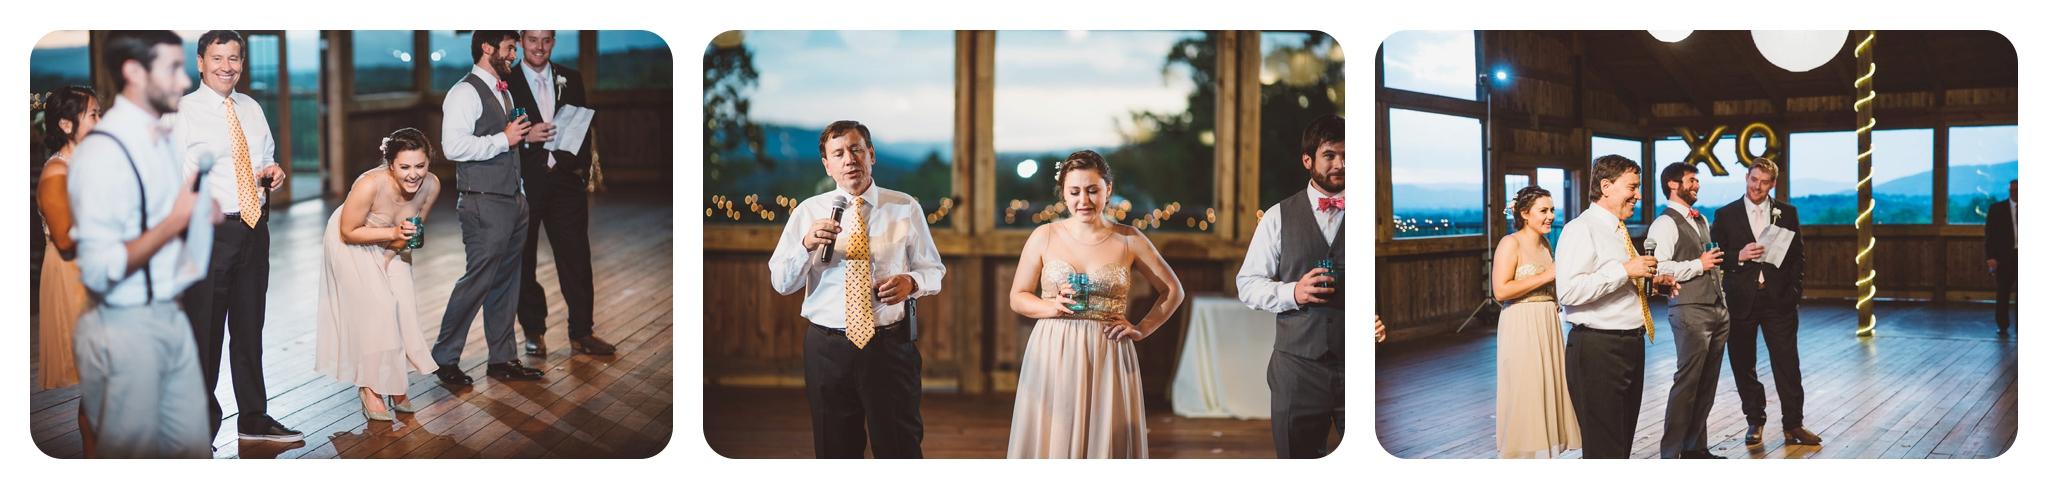 Braeloch-Weddings-Wedding-Photographer-Pat-Cori-Photography-037.jpg